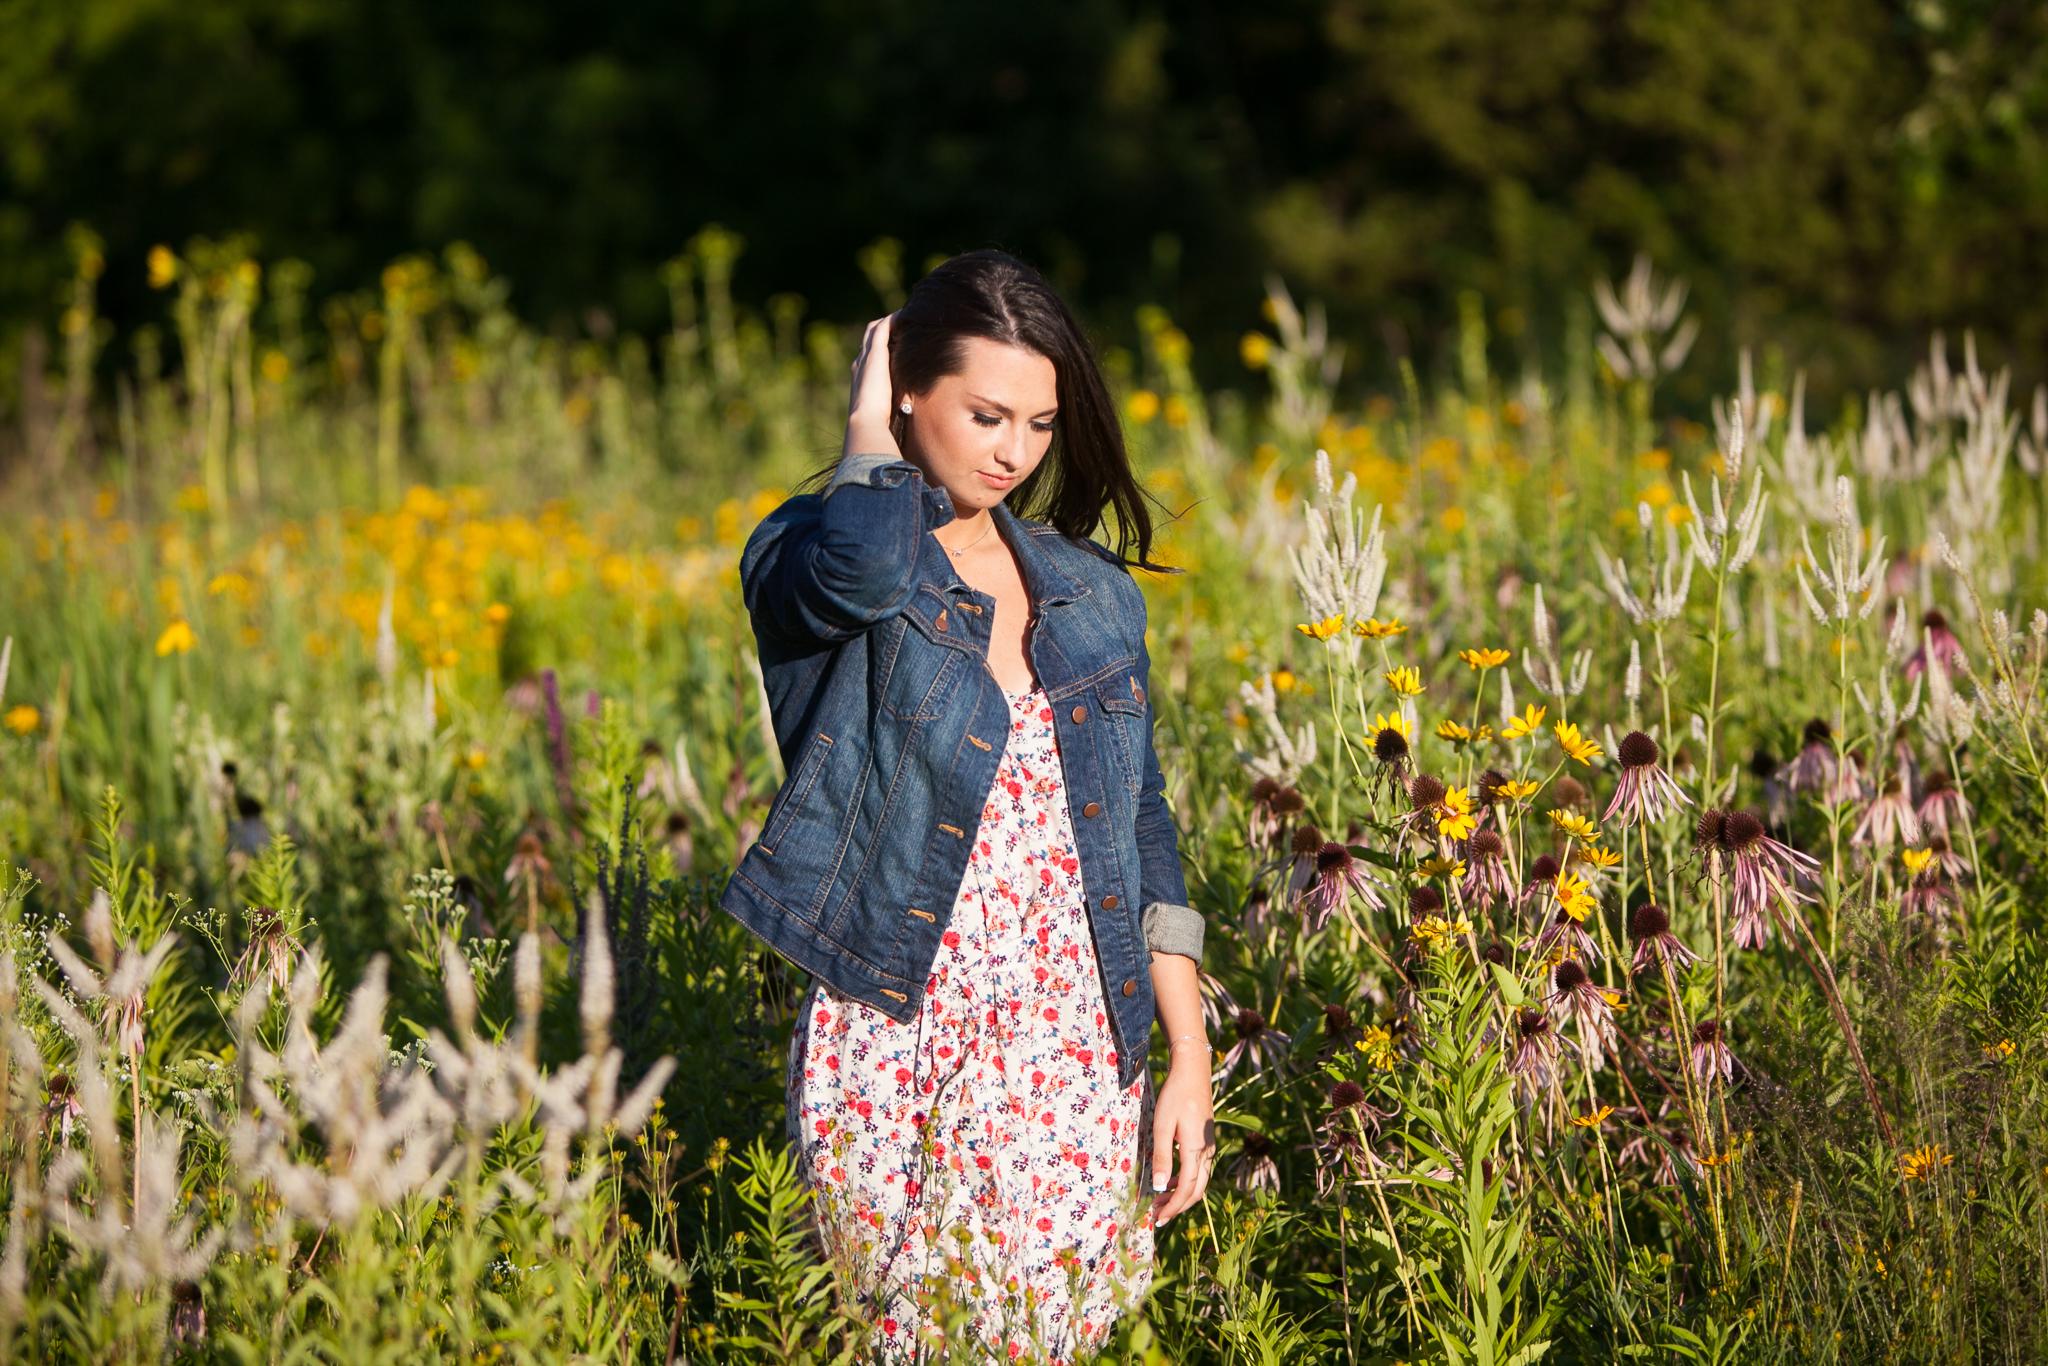 Madison_Wisconsin_Senior_Portrait_011.jpg